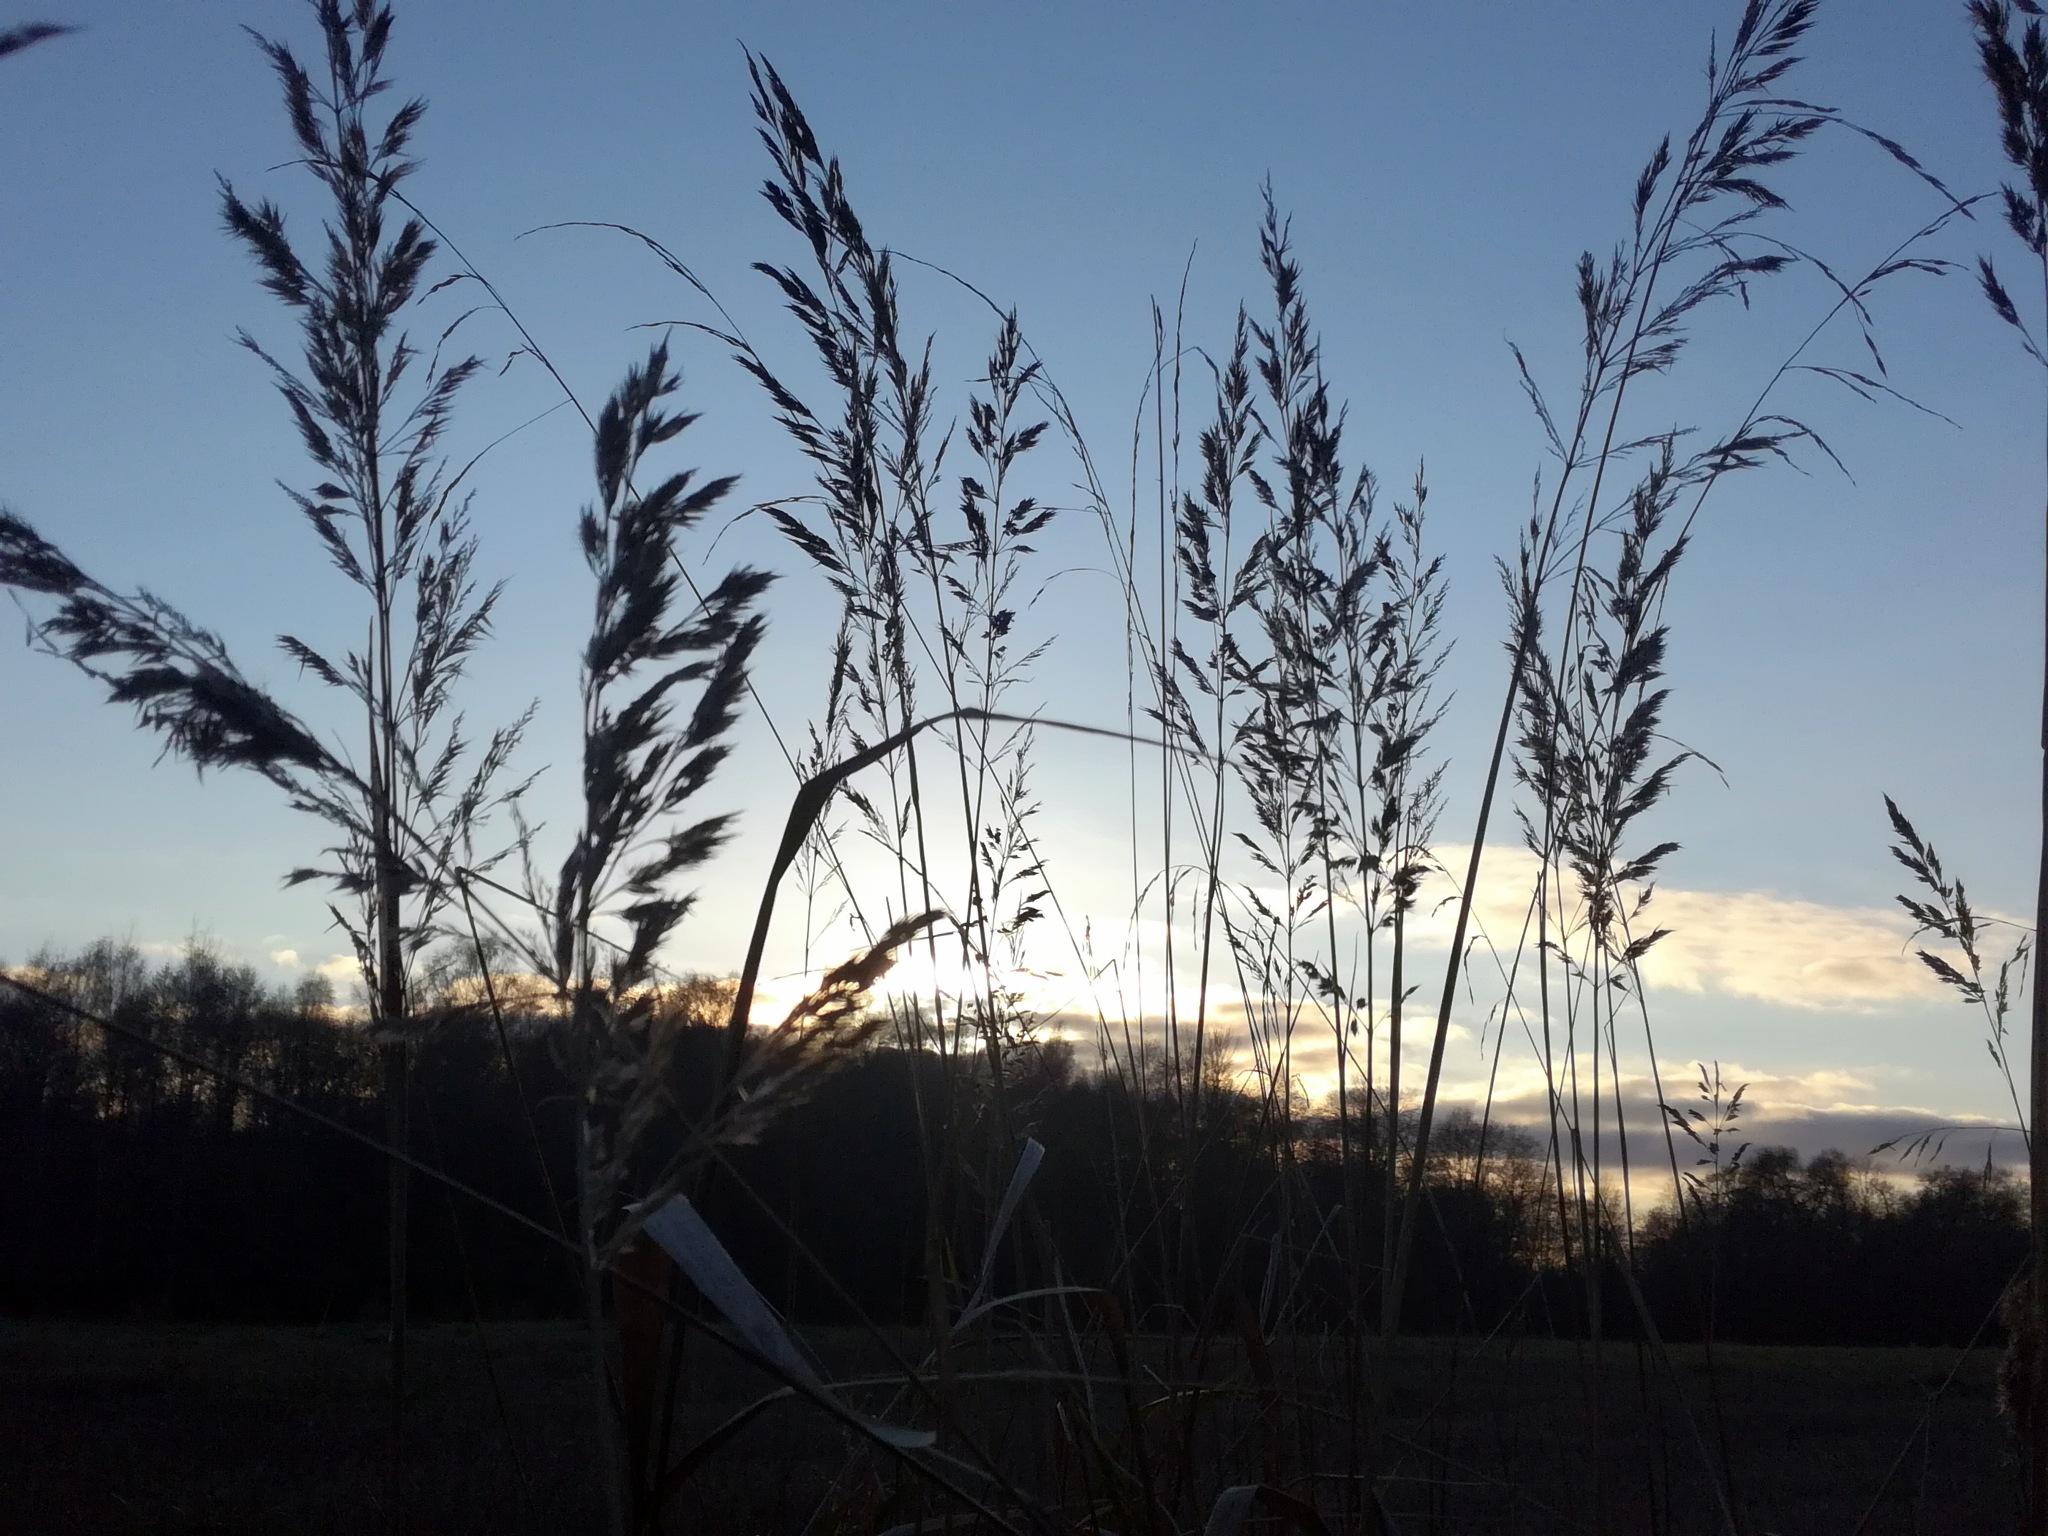 Evening by uzkuraitiene62